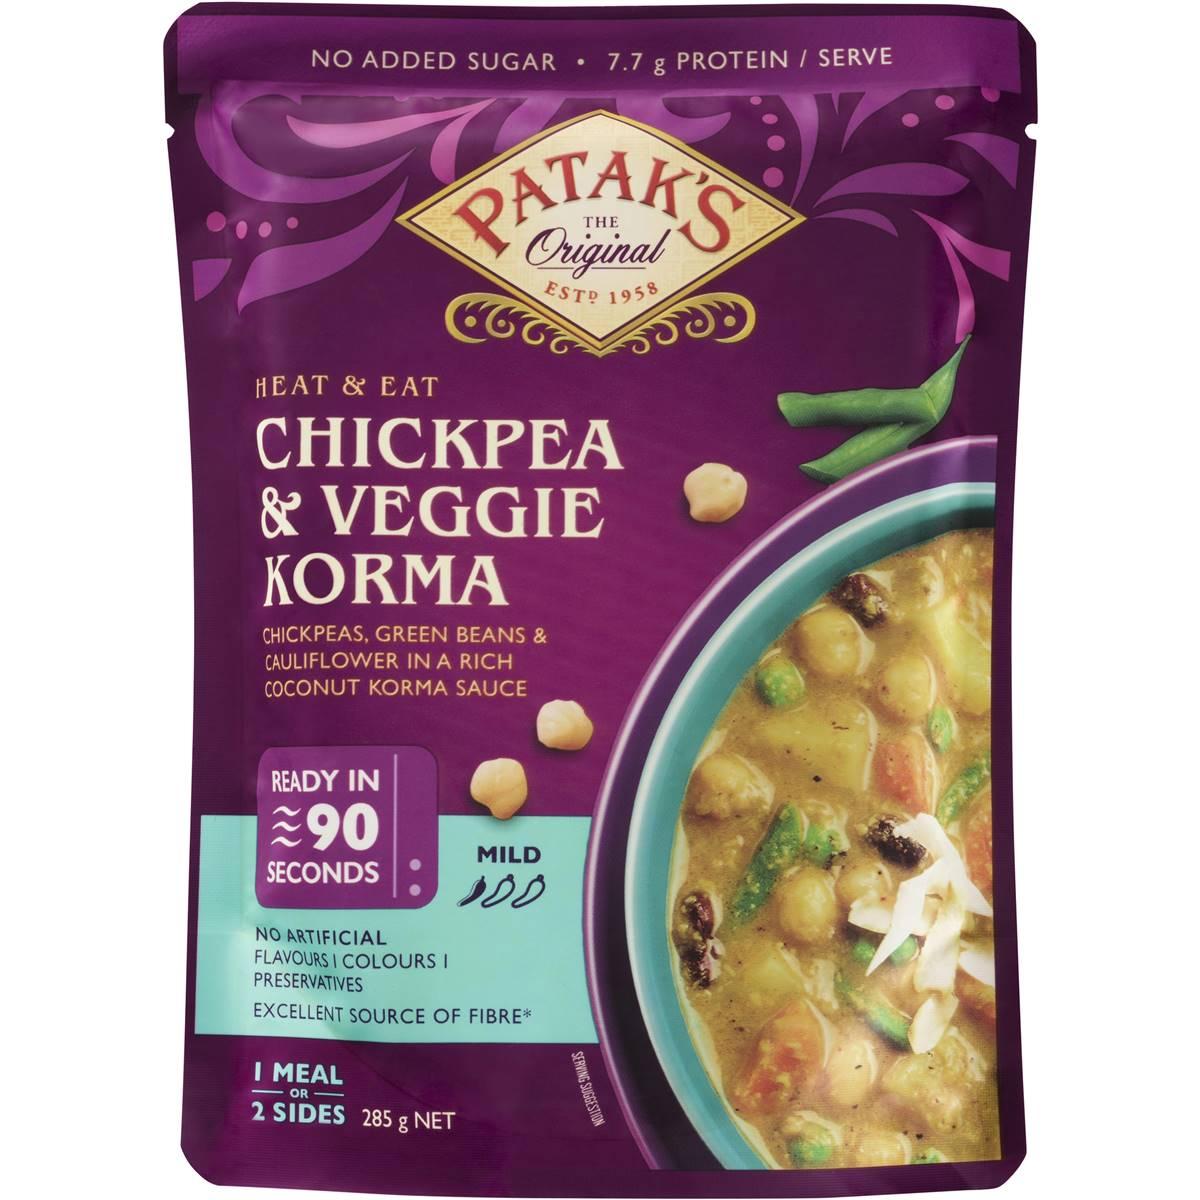 Patak's Butter Chickpeas & Veggies Heat & Eat